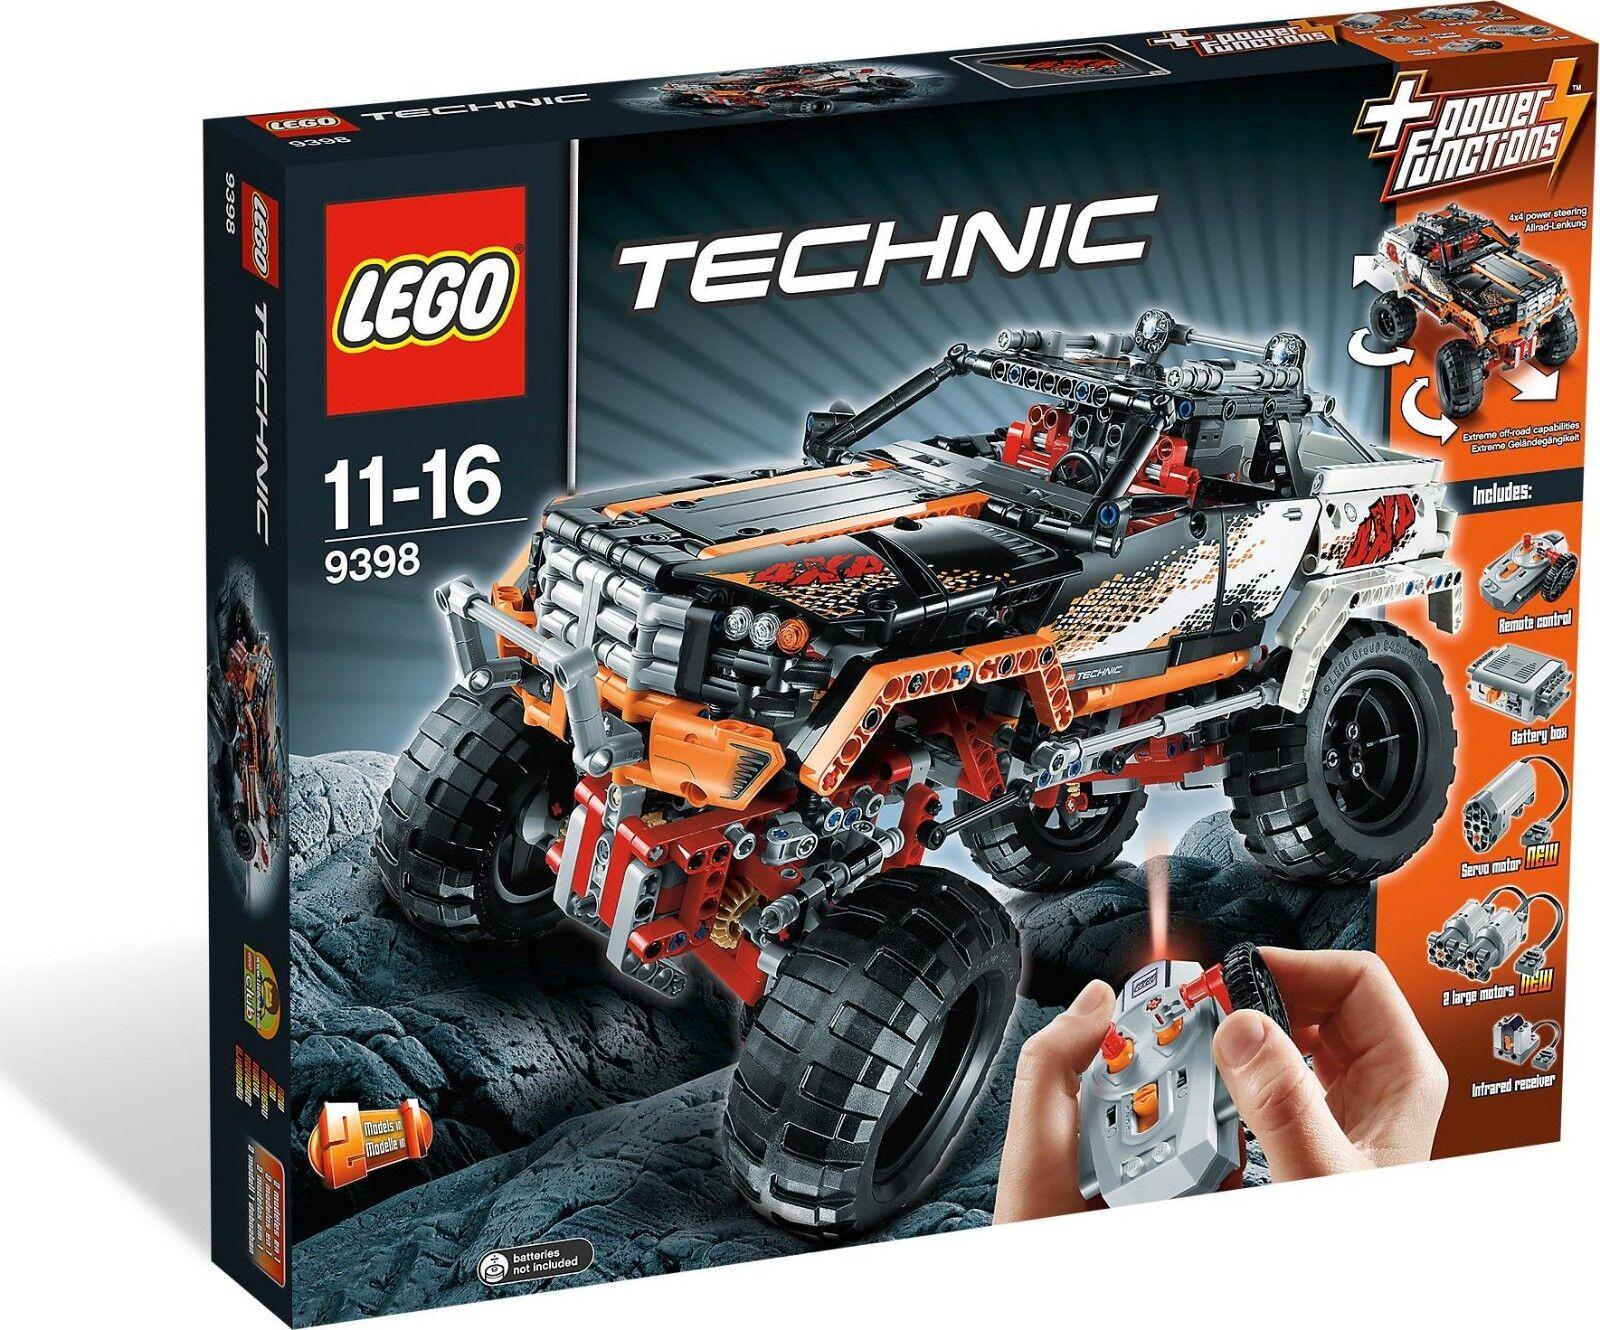 Lego Technic 9398 - Pickup 4X4 Nuevo Raro - Box Damage Caja Dañada